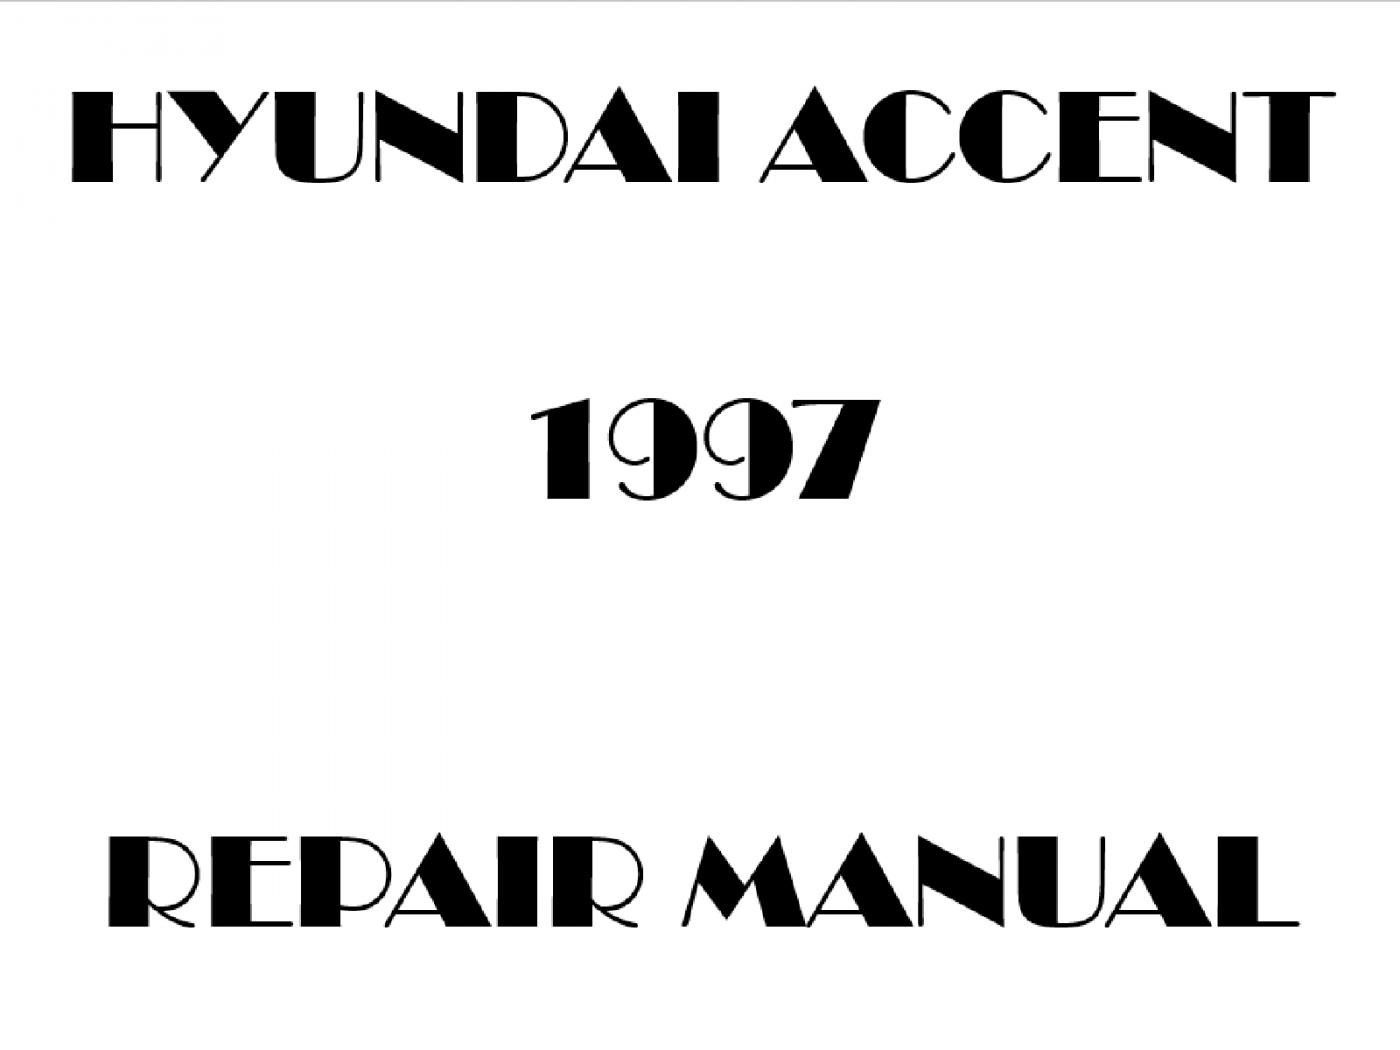 1997 Hyundai Accent repair manual